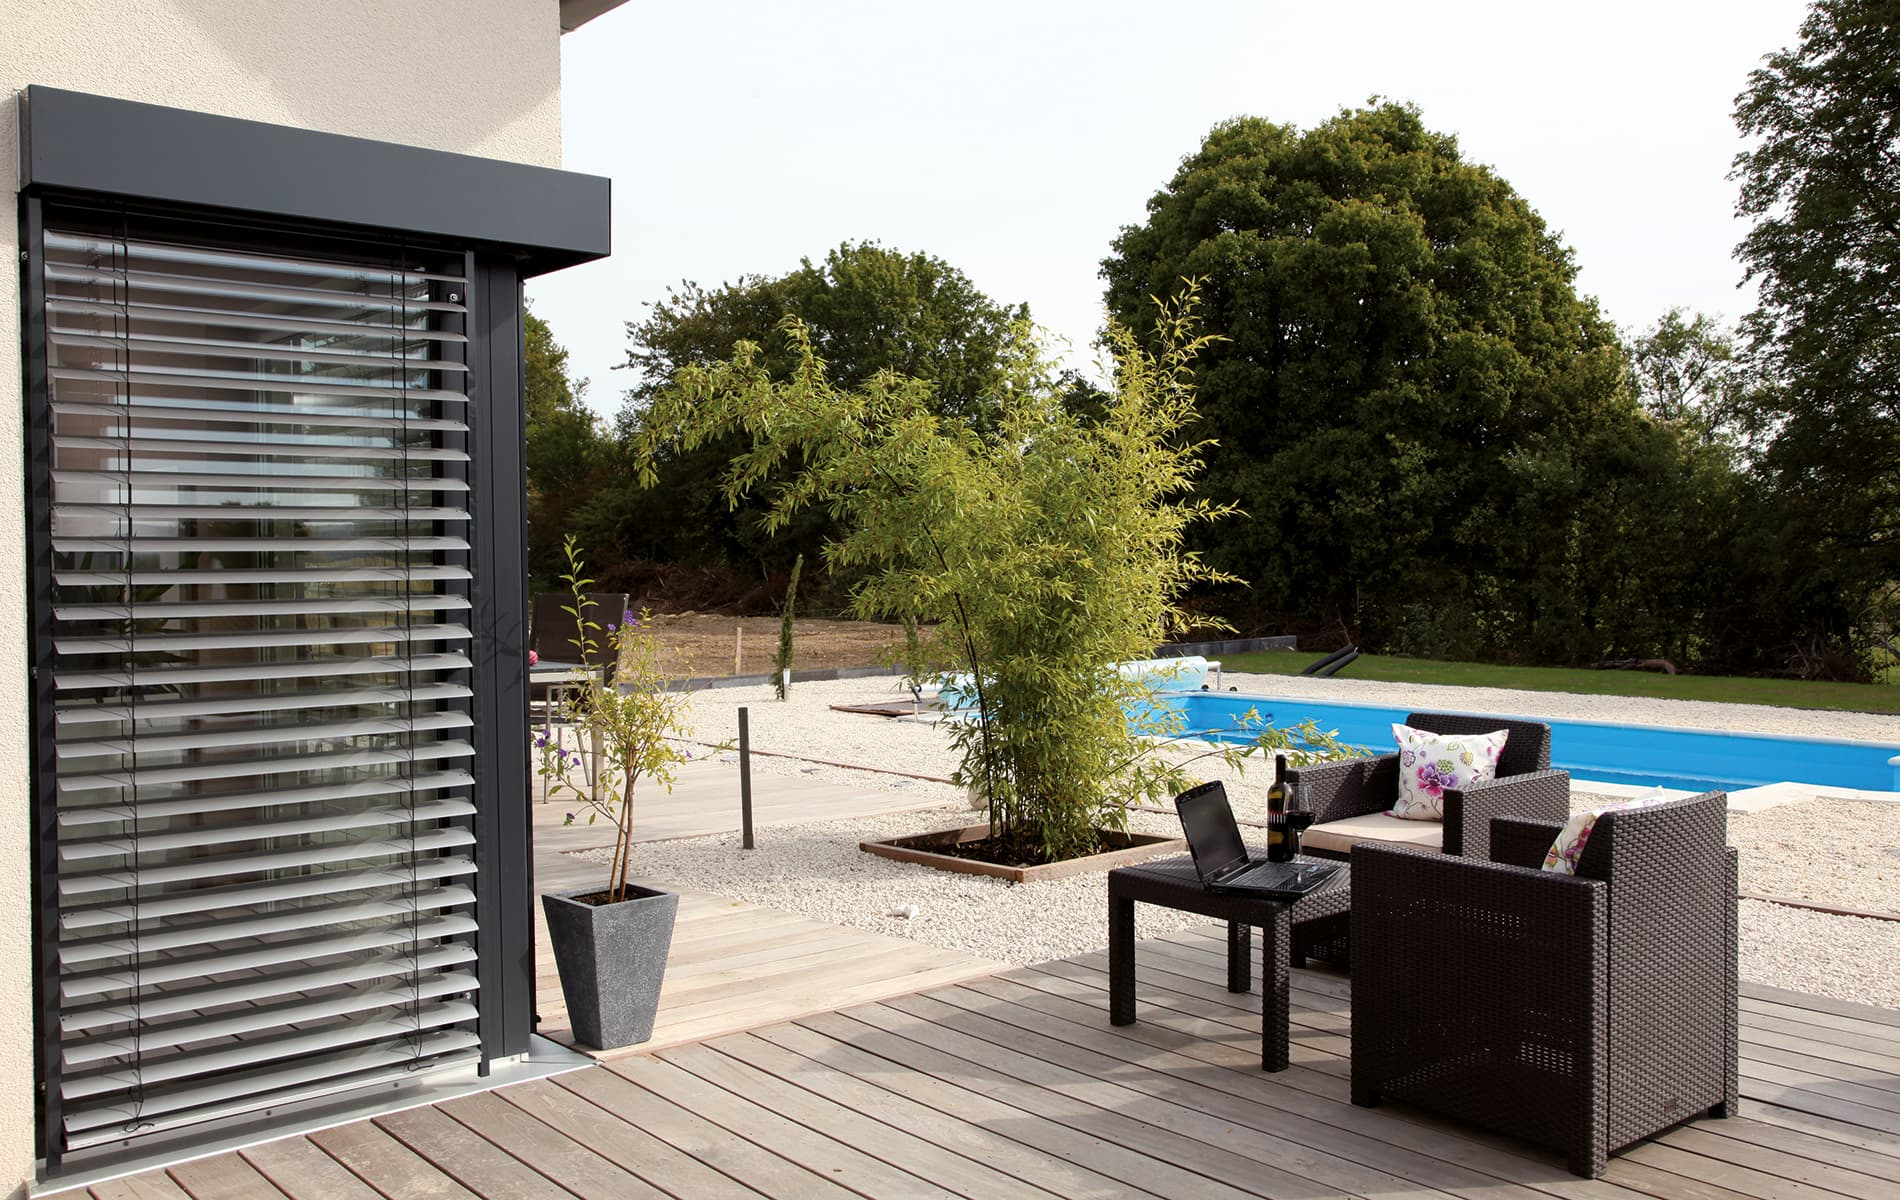 VIO - Terrasse mit Pool